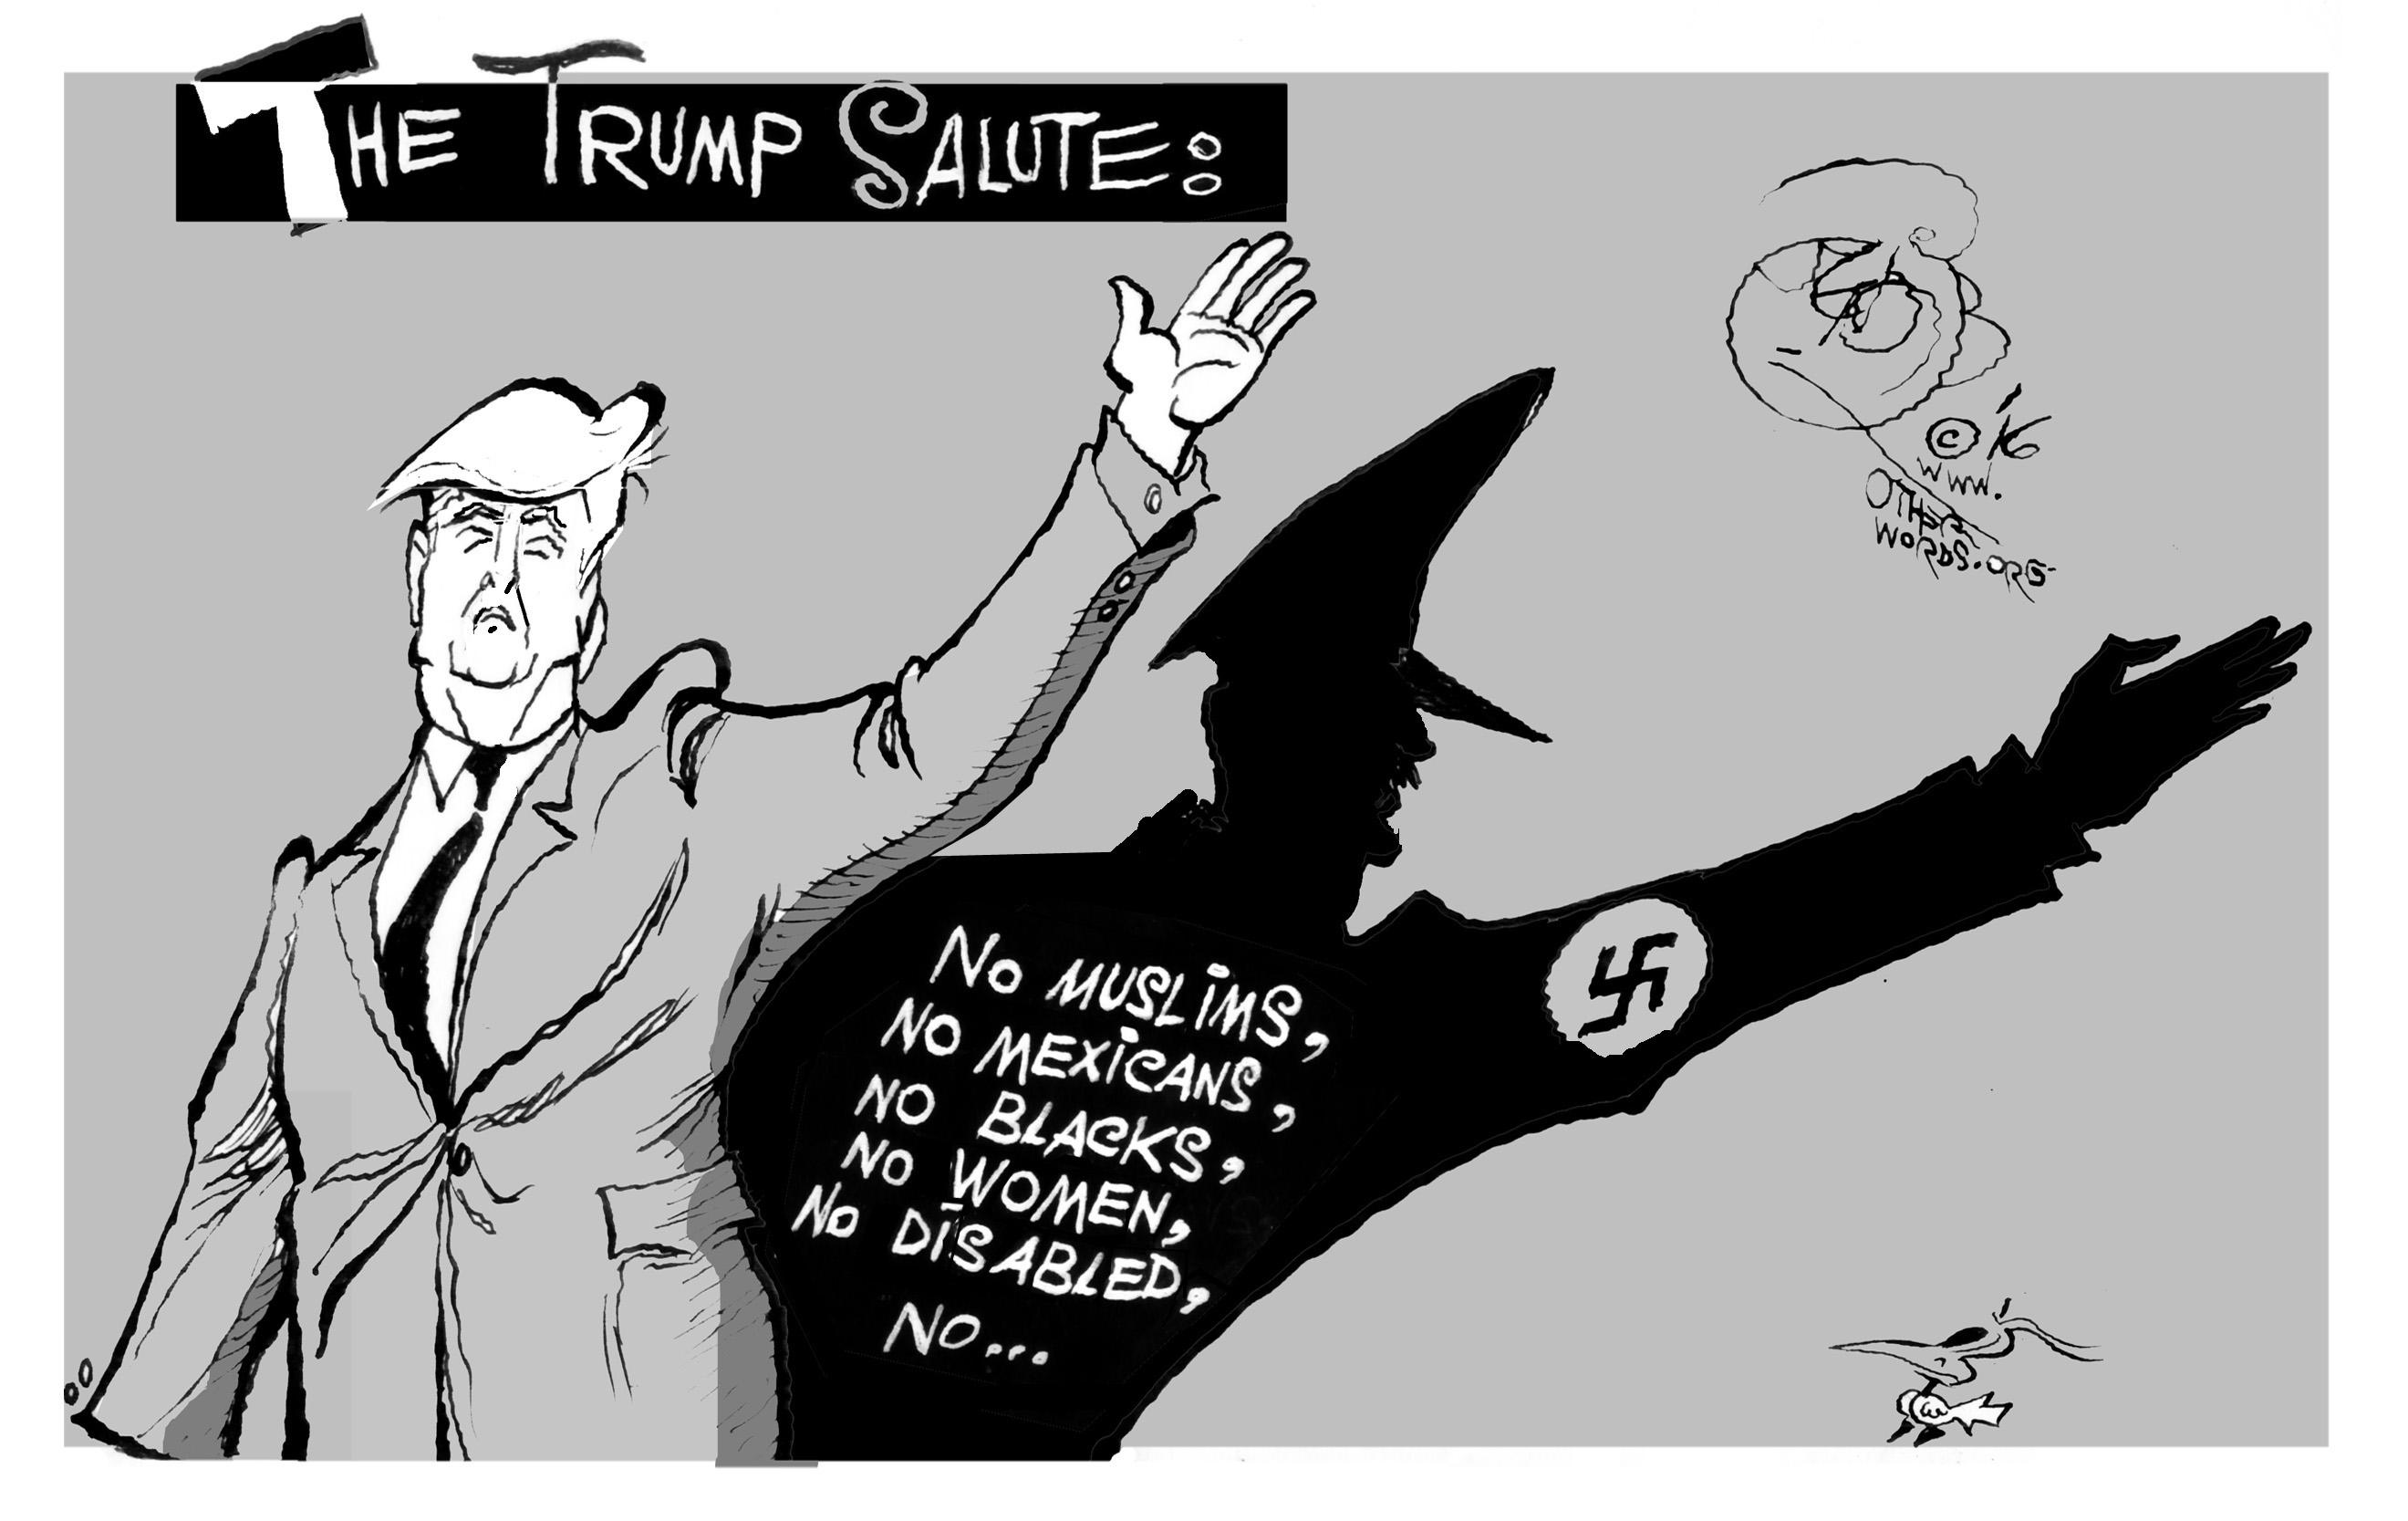 An American Mussolini